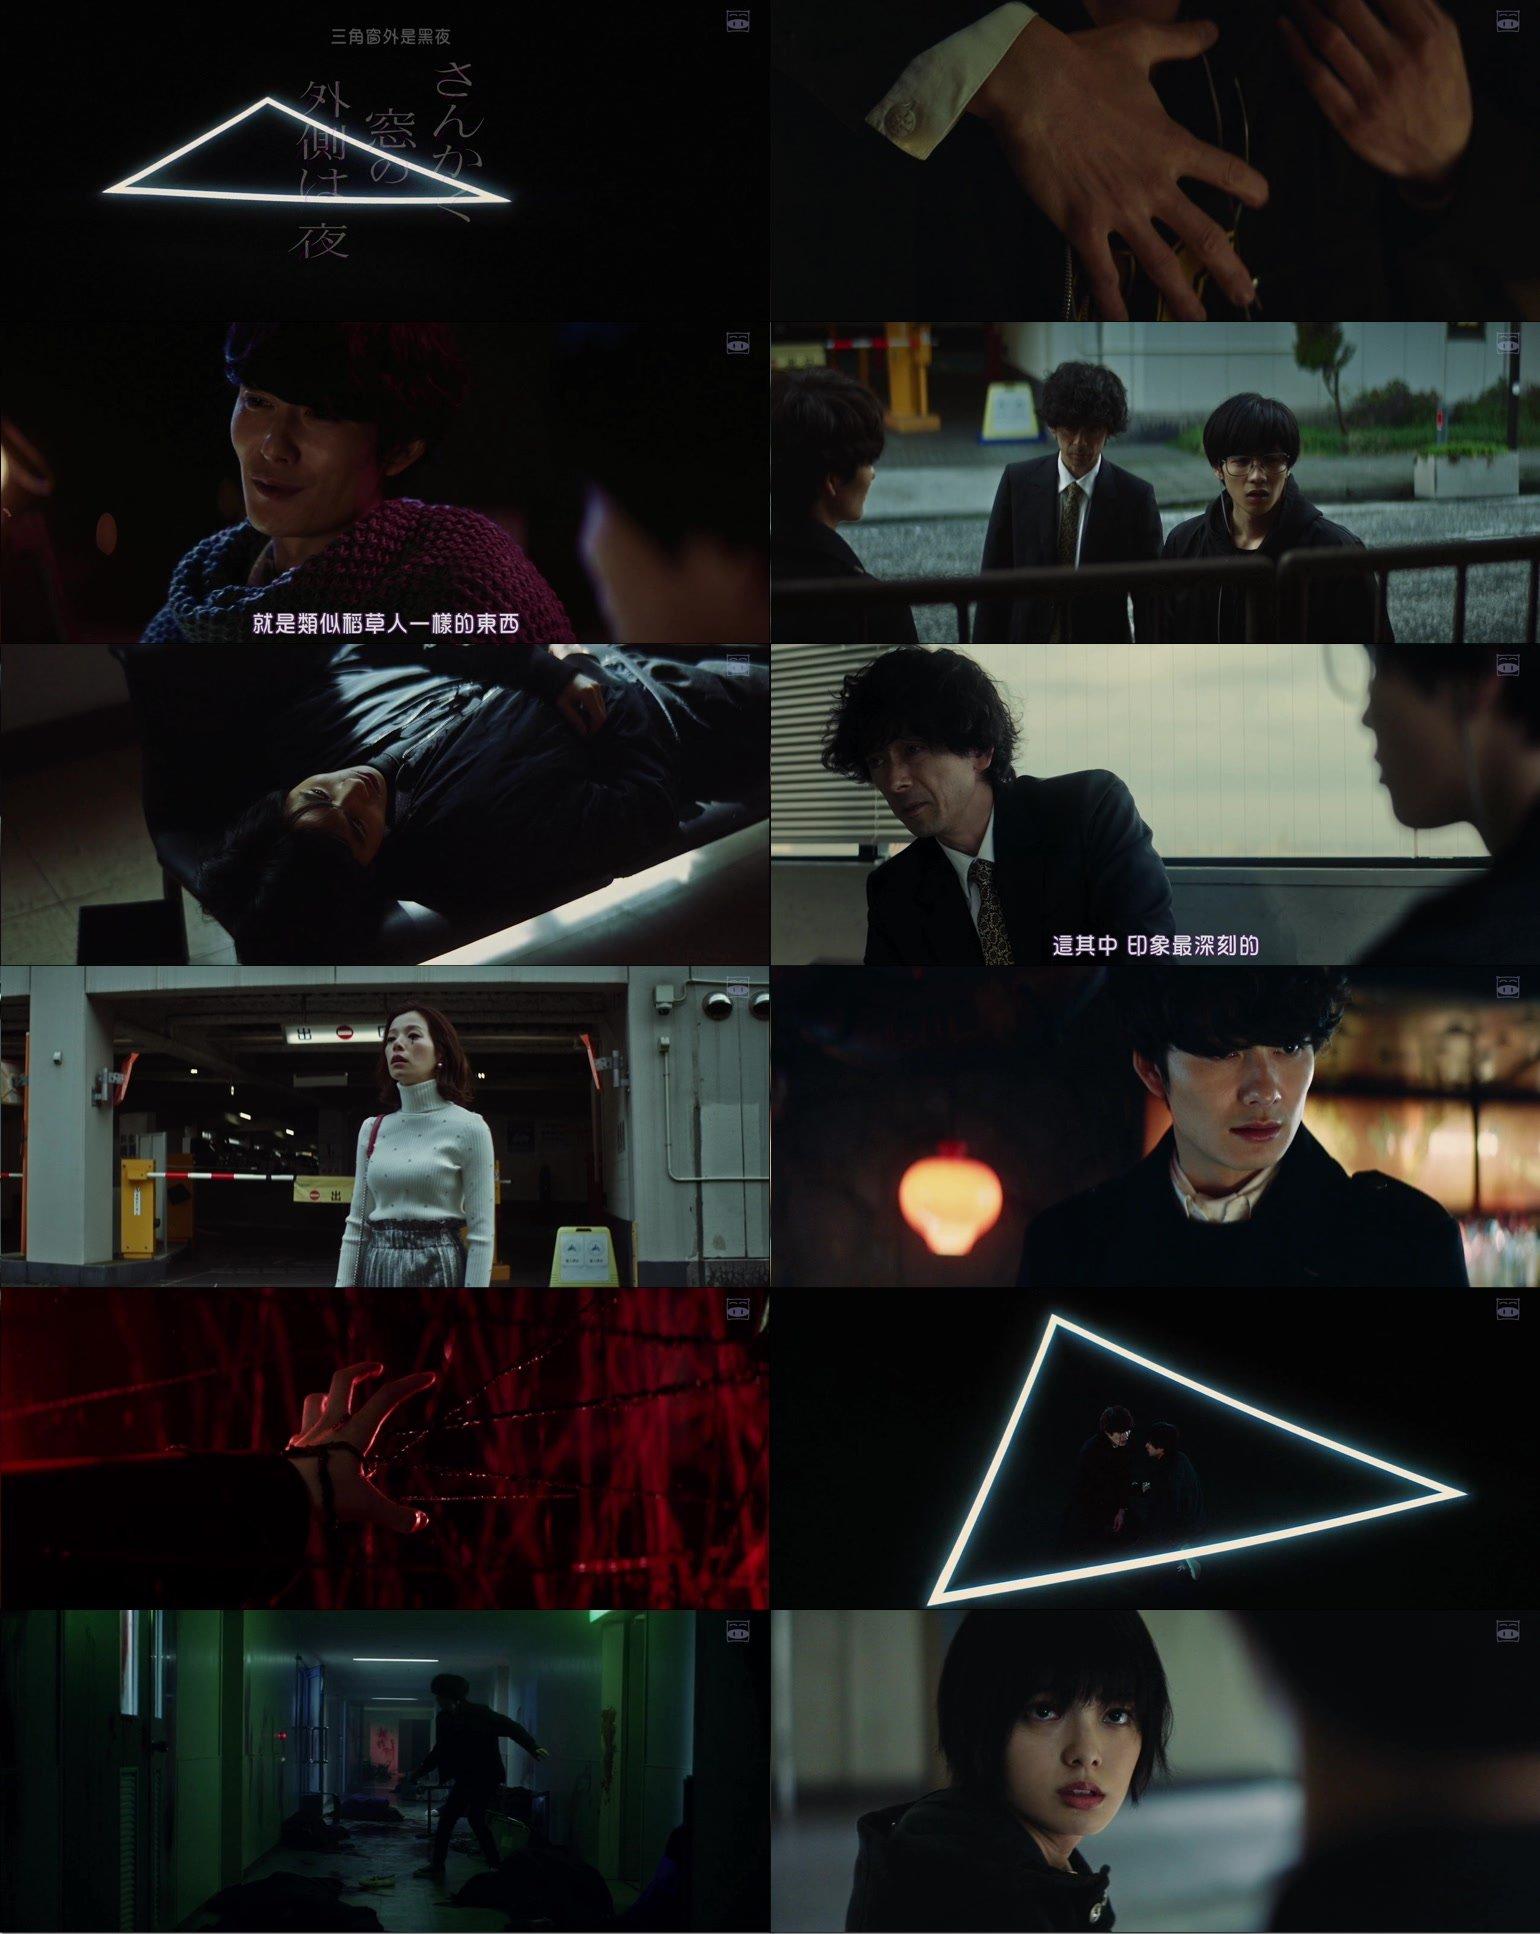 [x3]酸酸甜甜愛上妳 三角窗外是黑夜 以我兒子的名義.1080p[繁簡英]